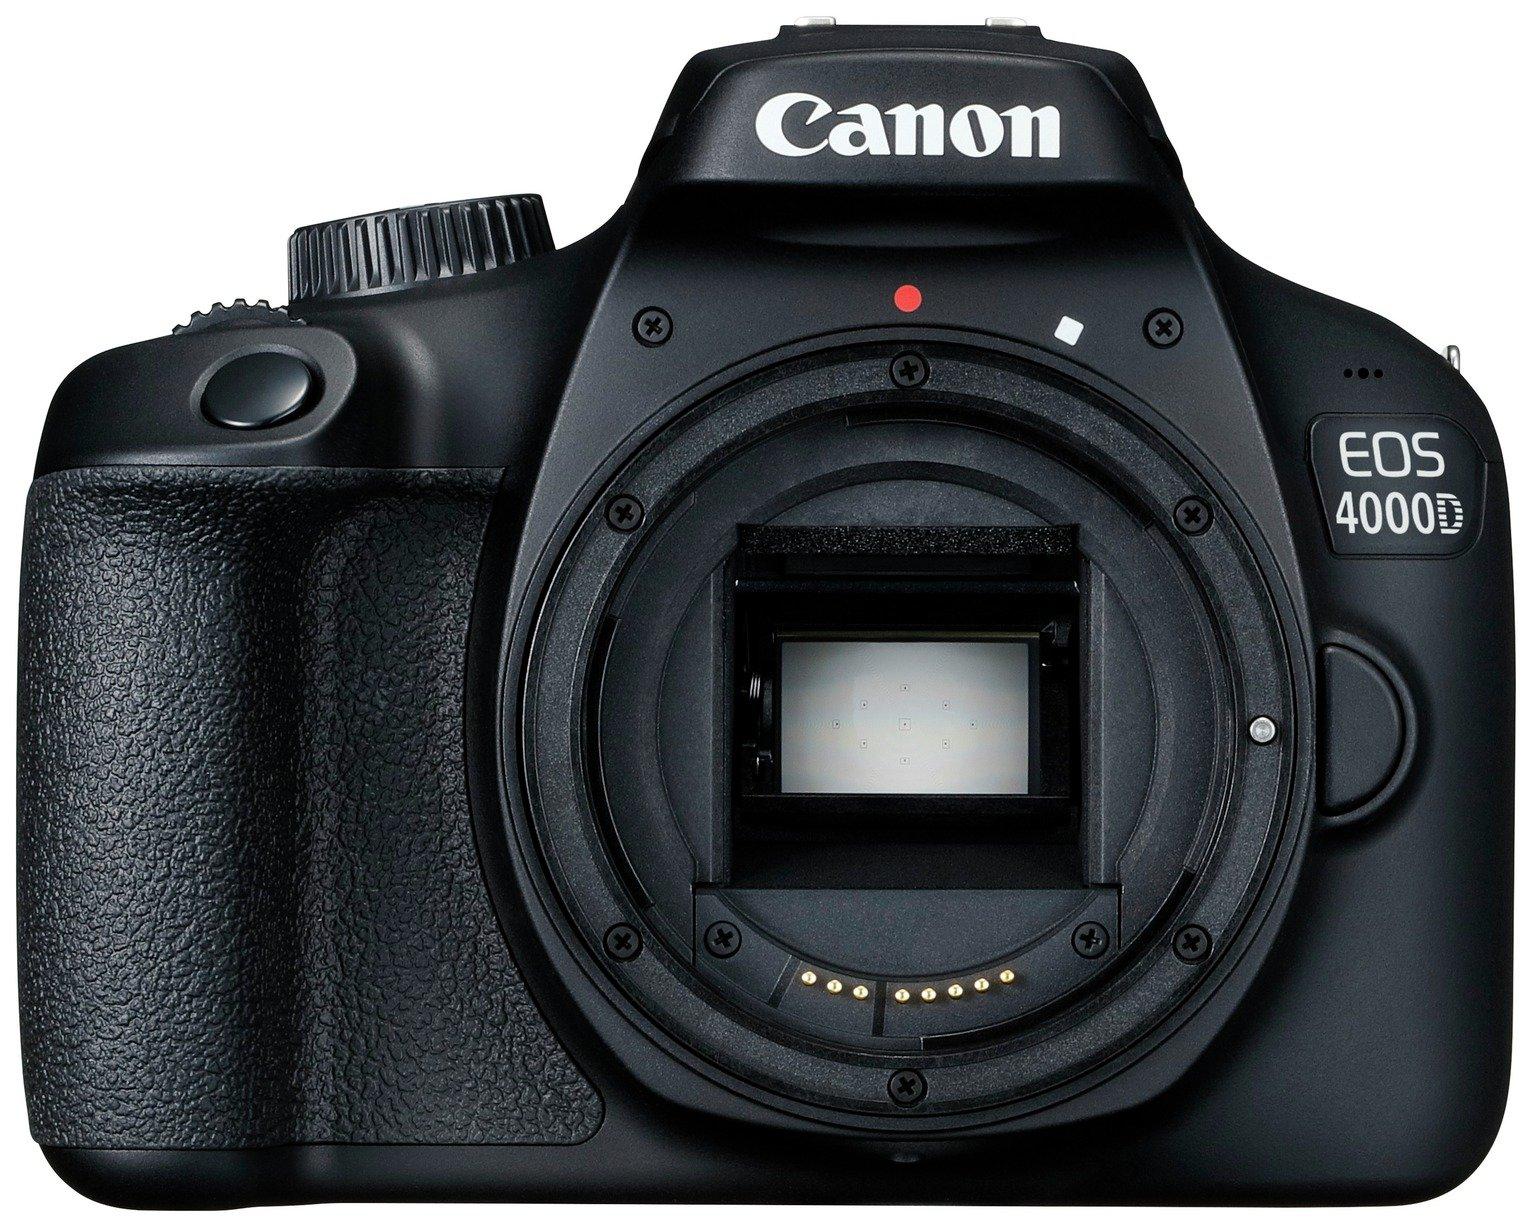 Image of Canon EOS 4000D DSLR Camera Body